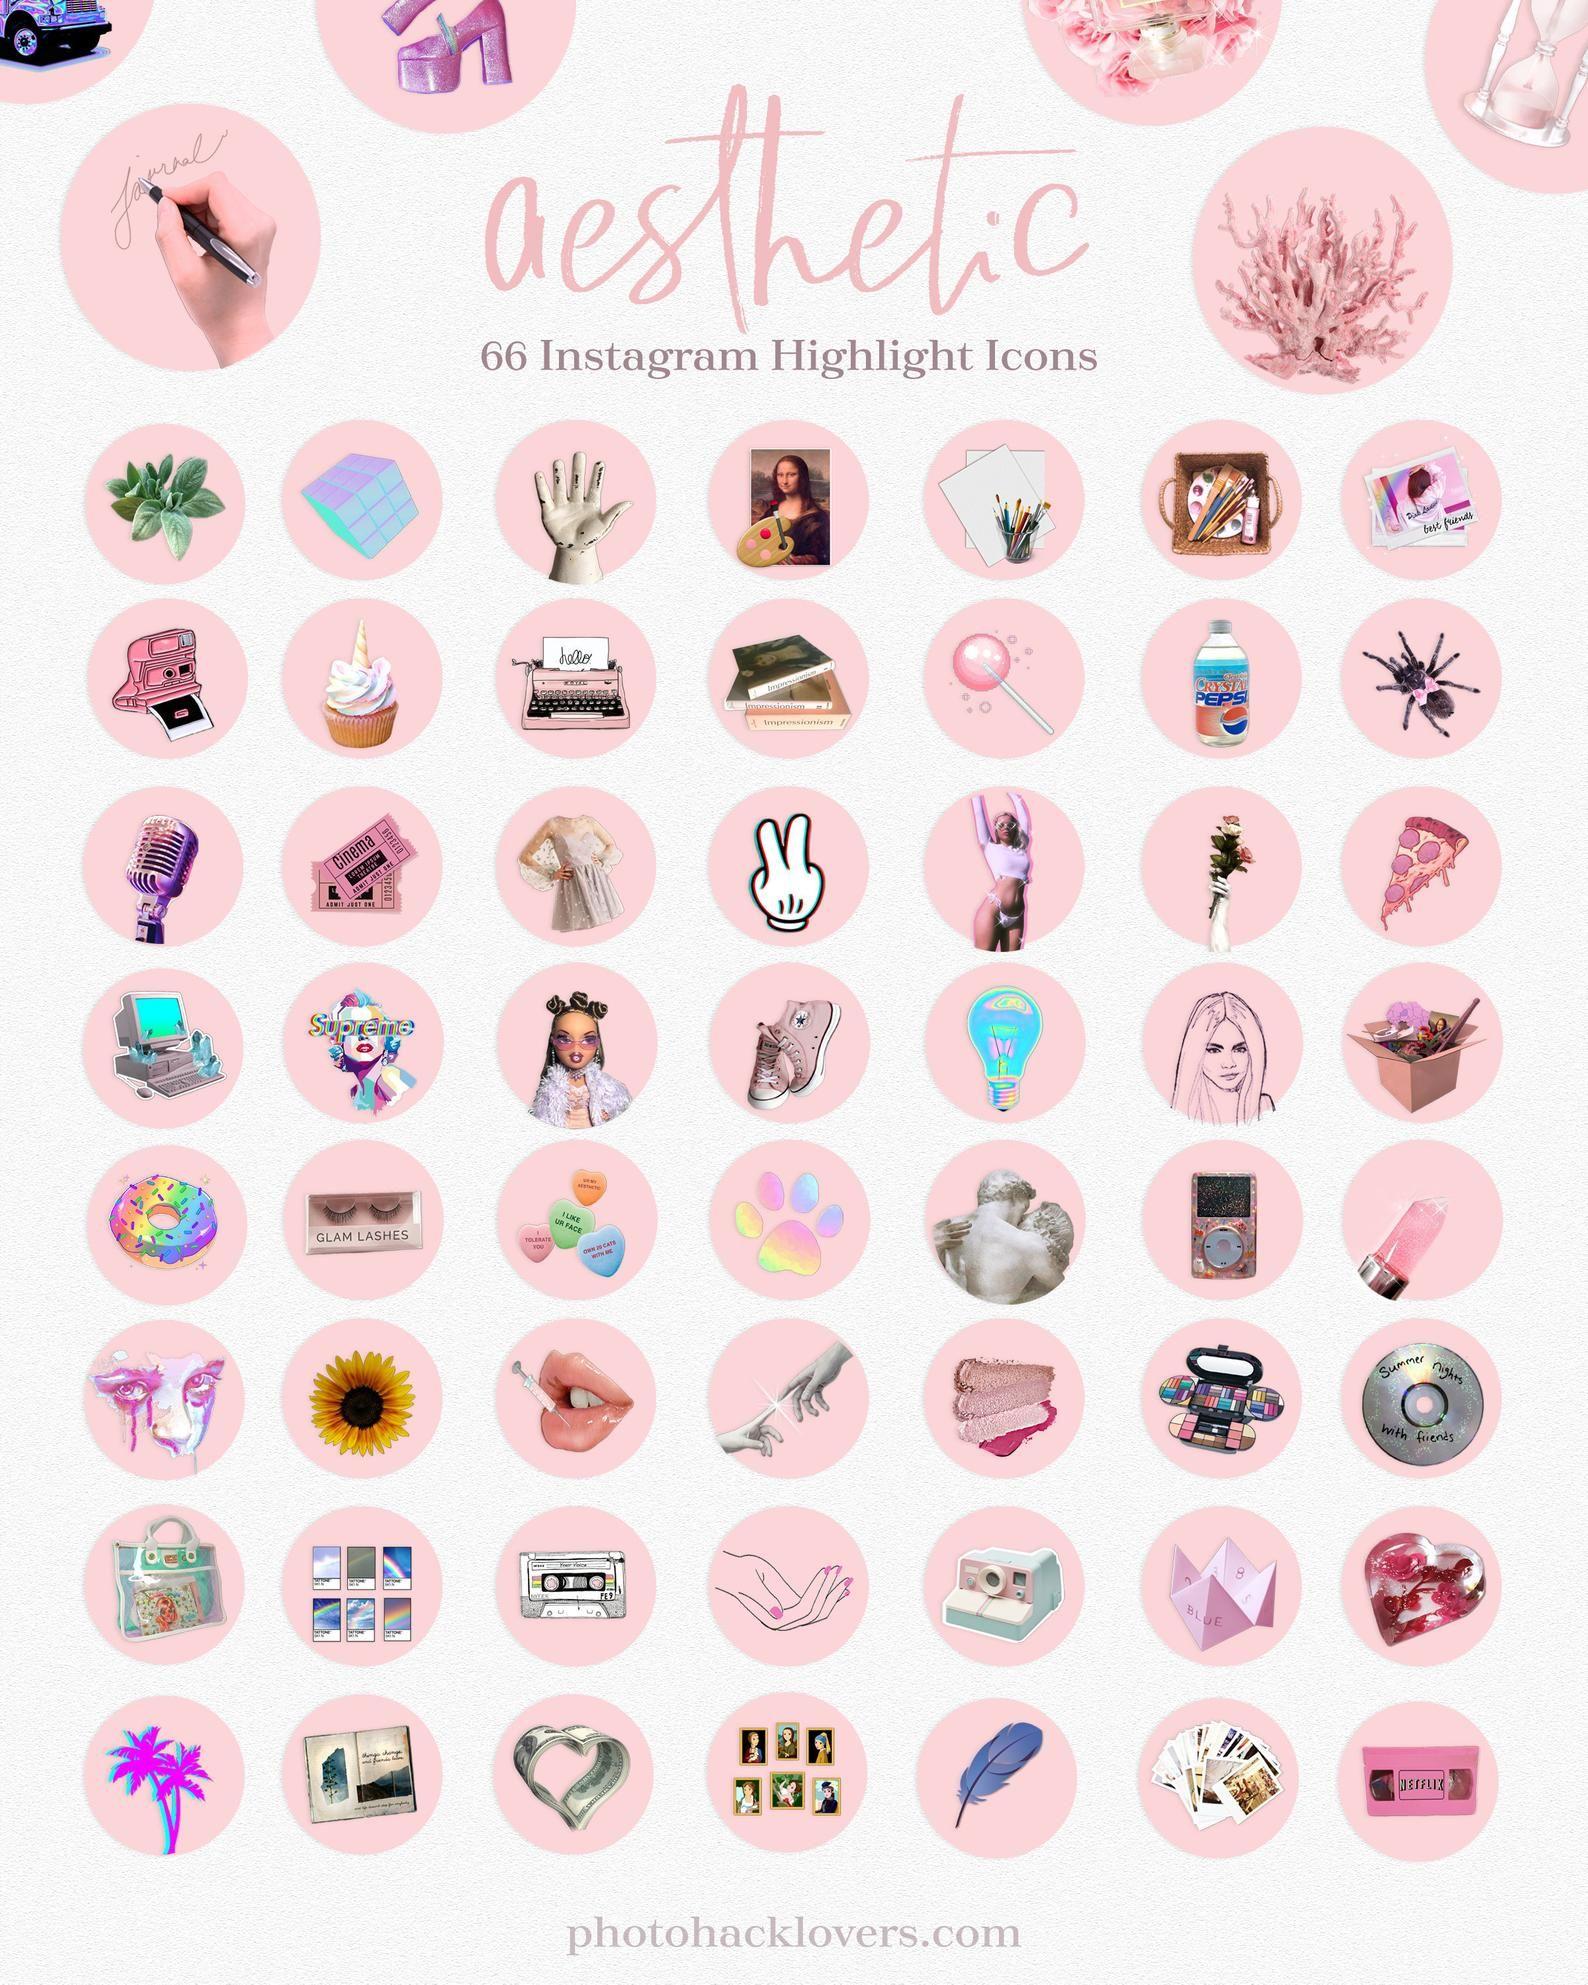 Instagram Highlights Aesthetic Instagram Icons Etsy In 2020 Instagram Aesthetic Instagram Highlight Icons Instagram Icons